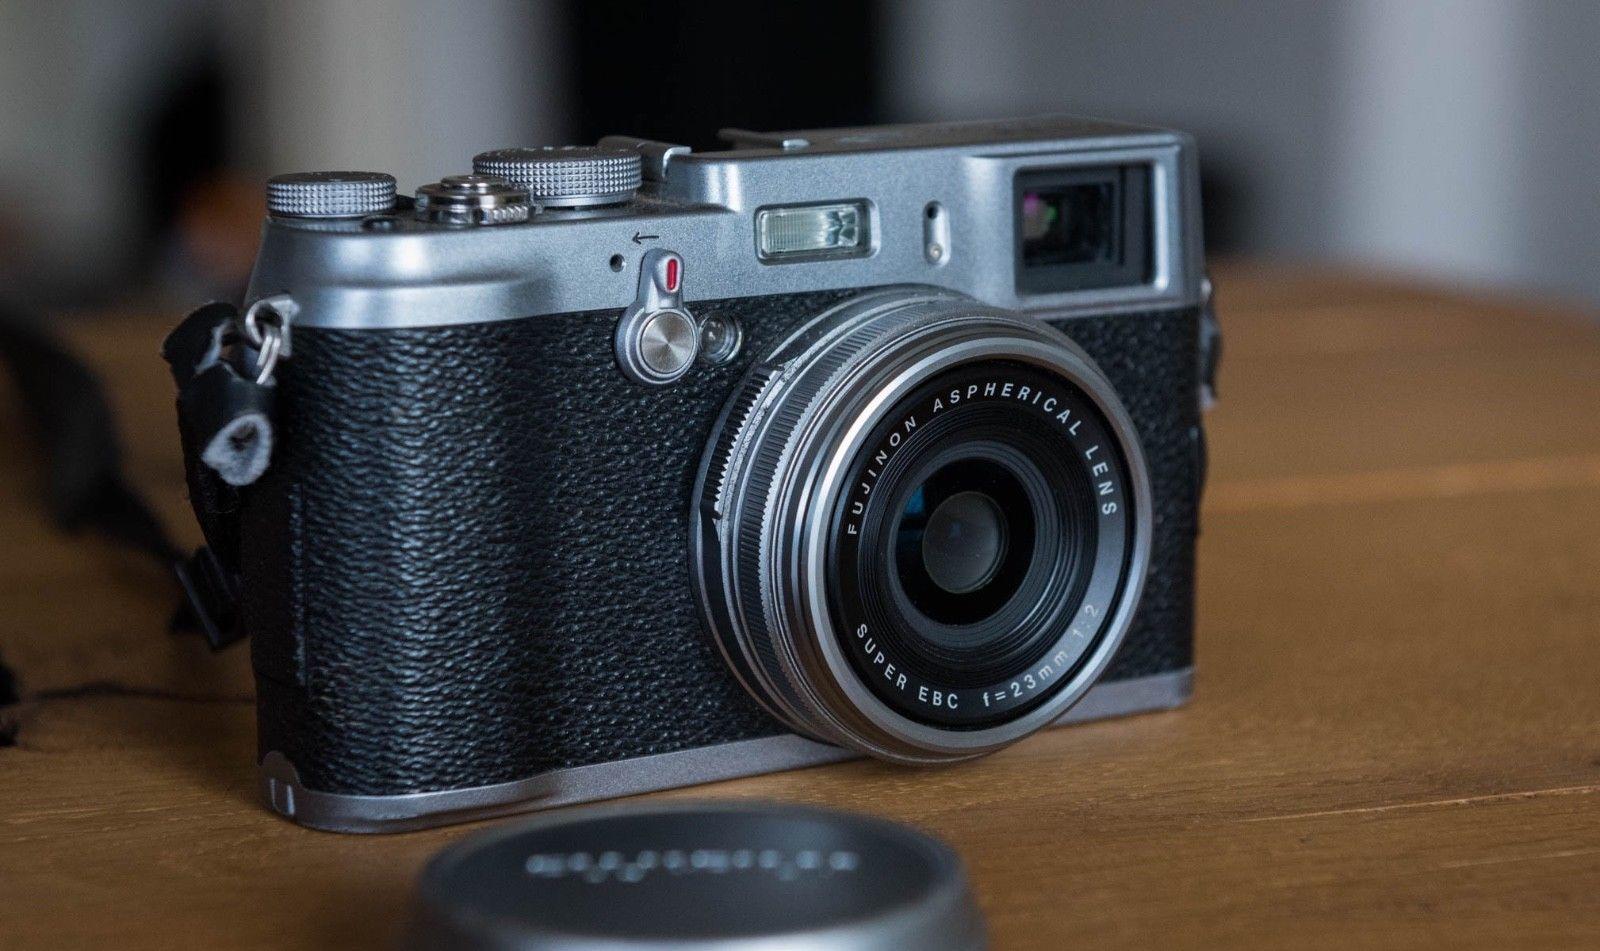 Fujifilm Fuji X100 12.3MP Digitalkamera - Silber